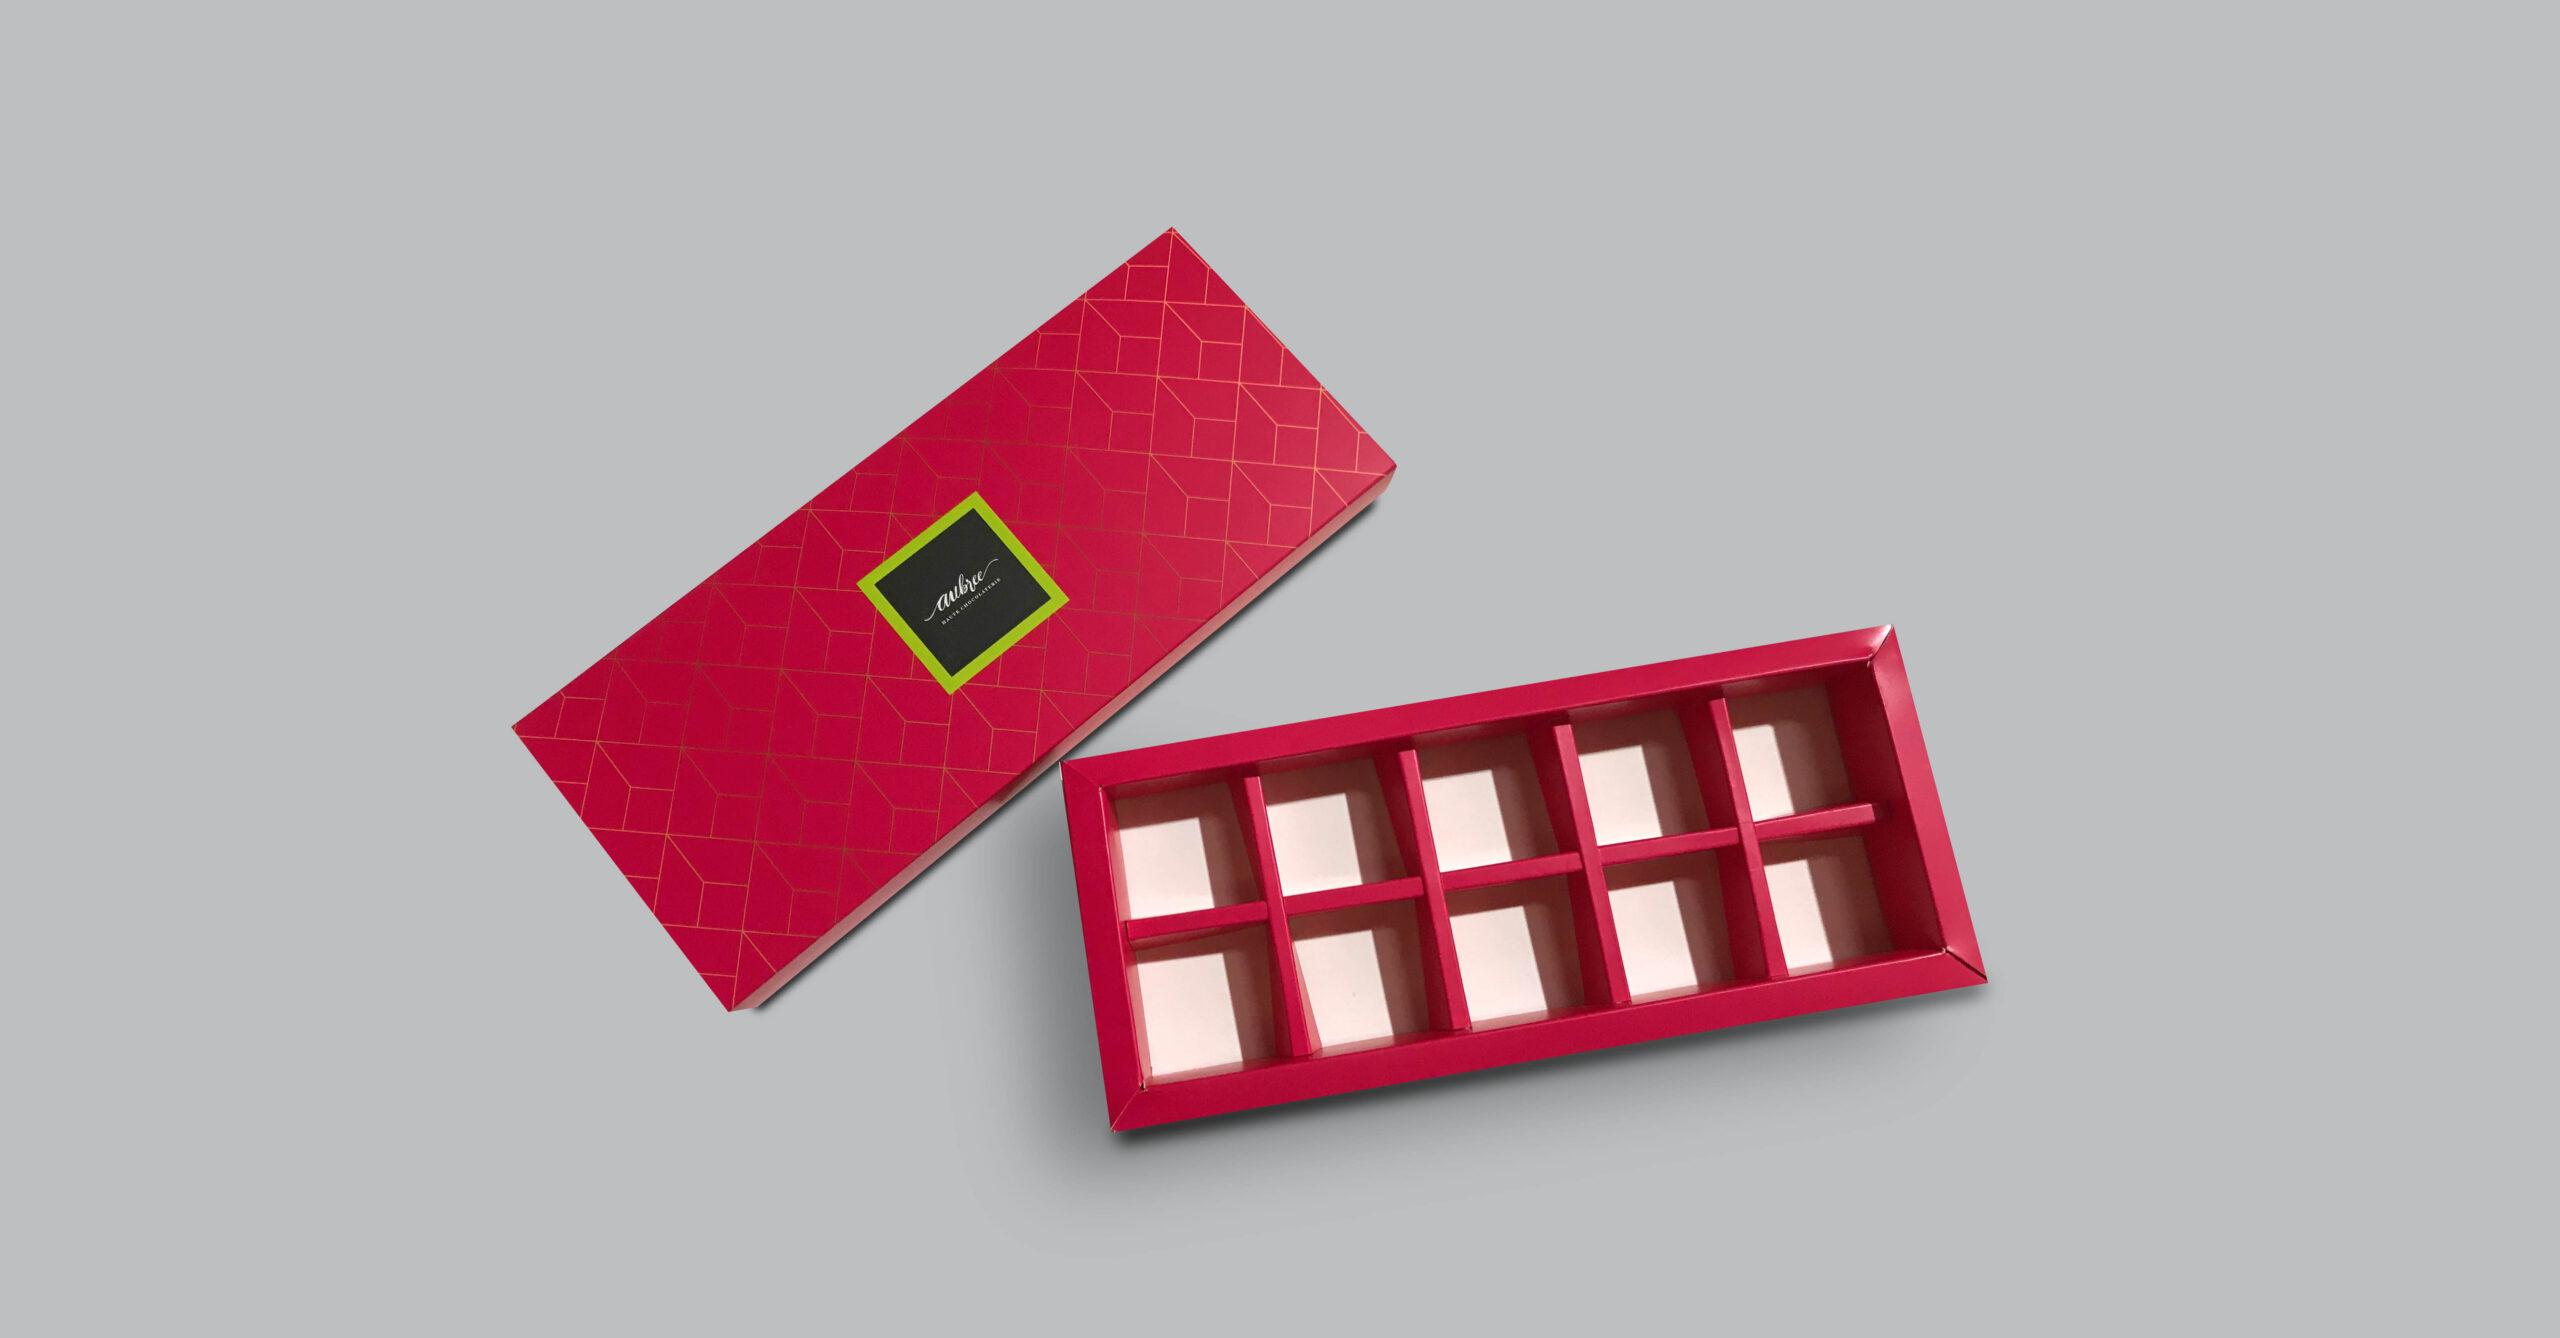 Aubree - Chocolate Box 2 Aubree - Chocolate Box